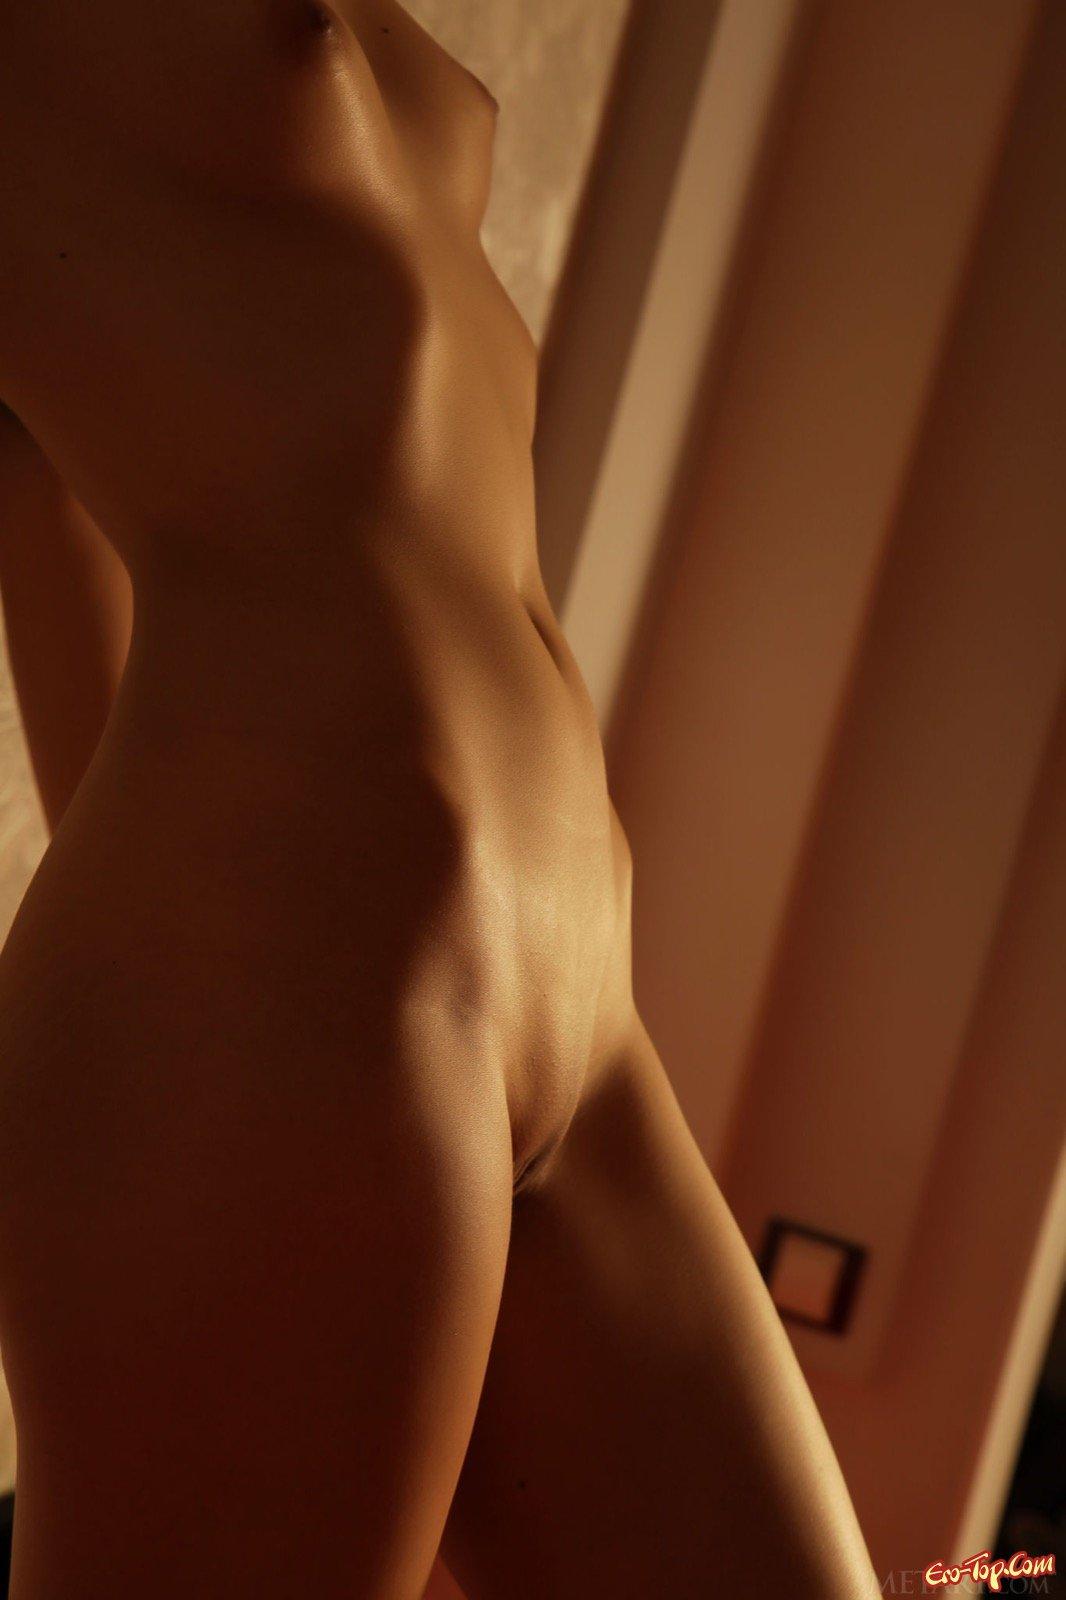 Фрау с плоским животиком и маленькими титьками секс фото